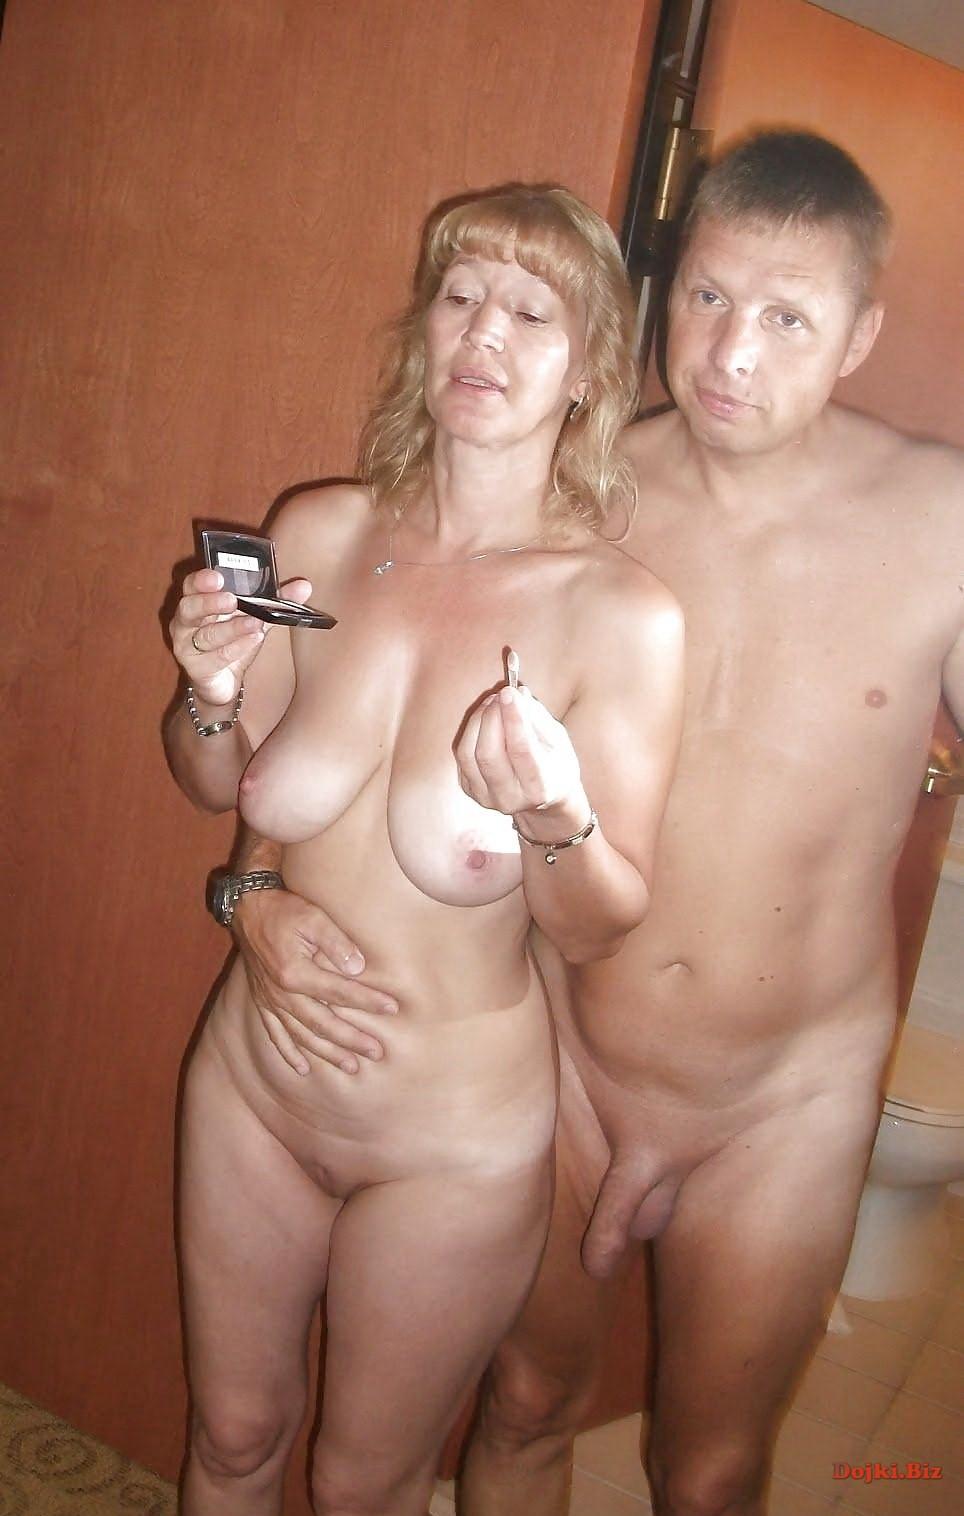 Зрелая голая пара голышём в готеле